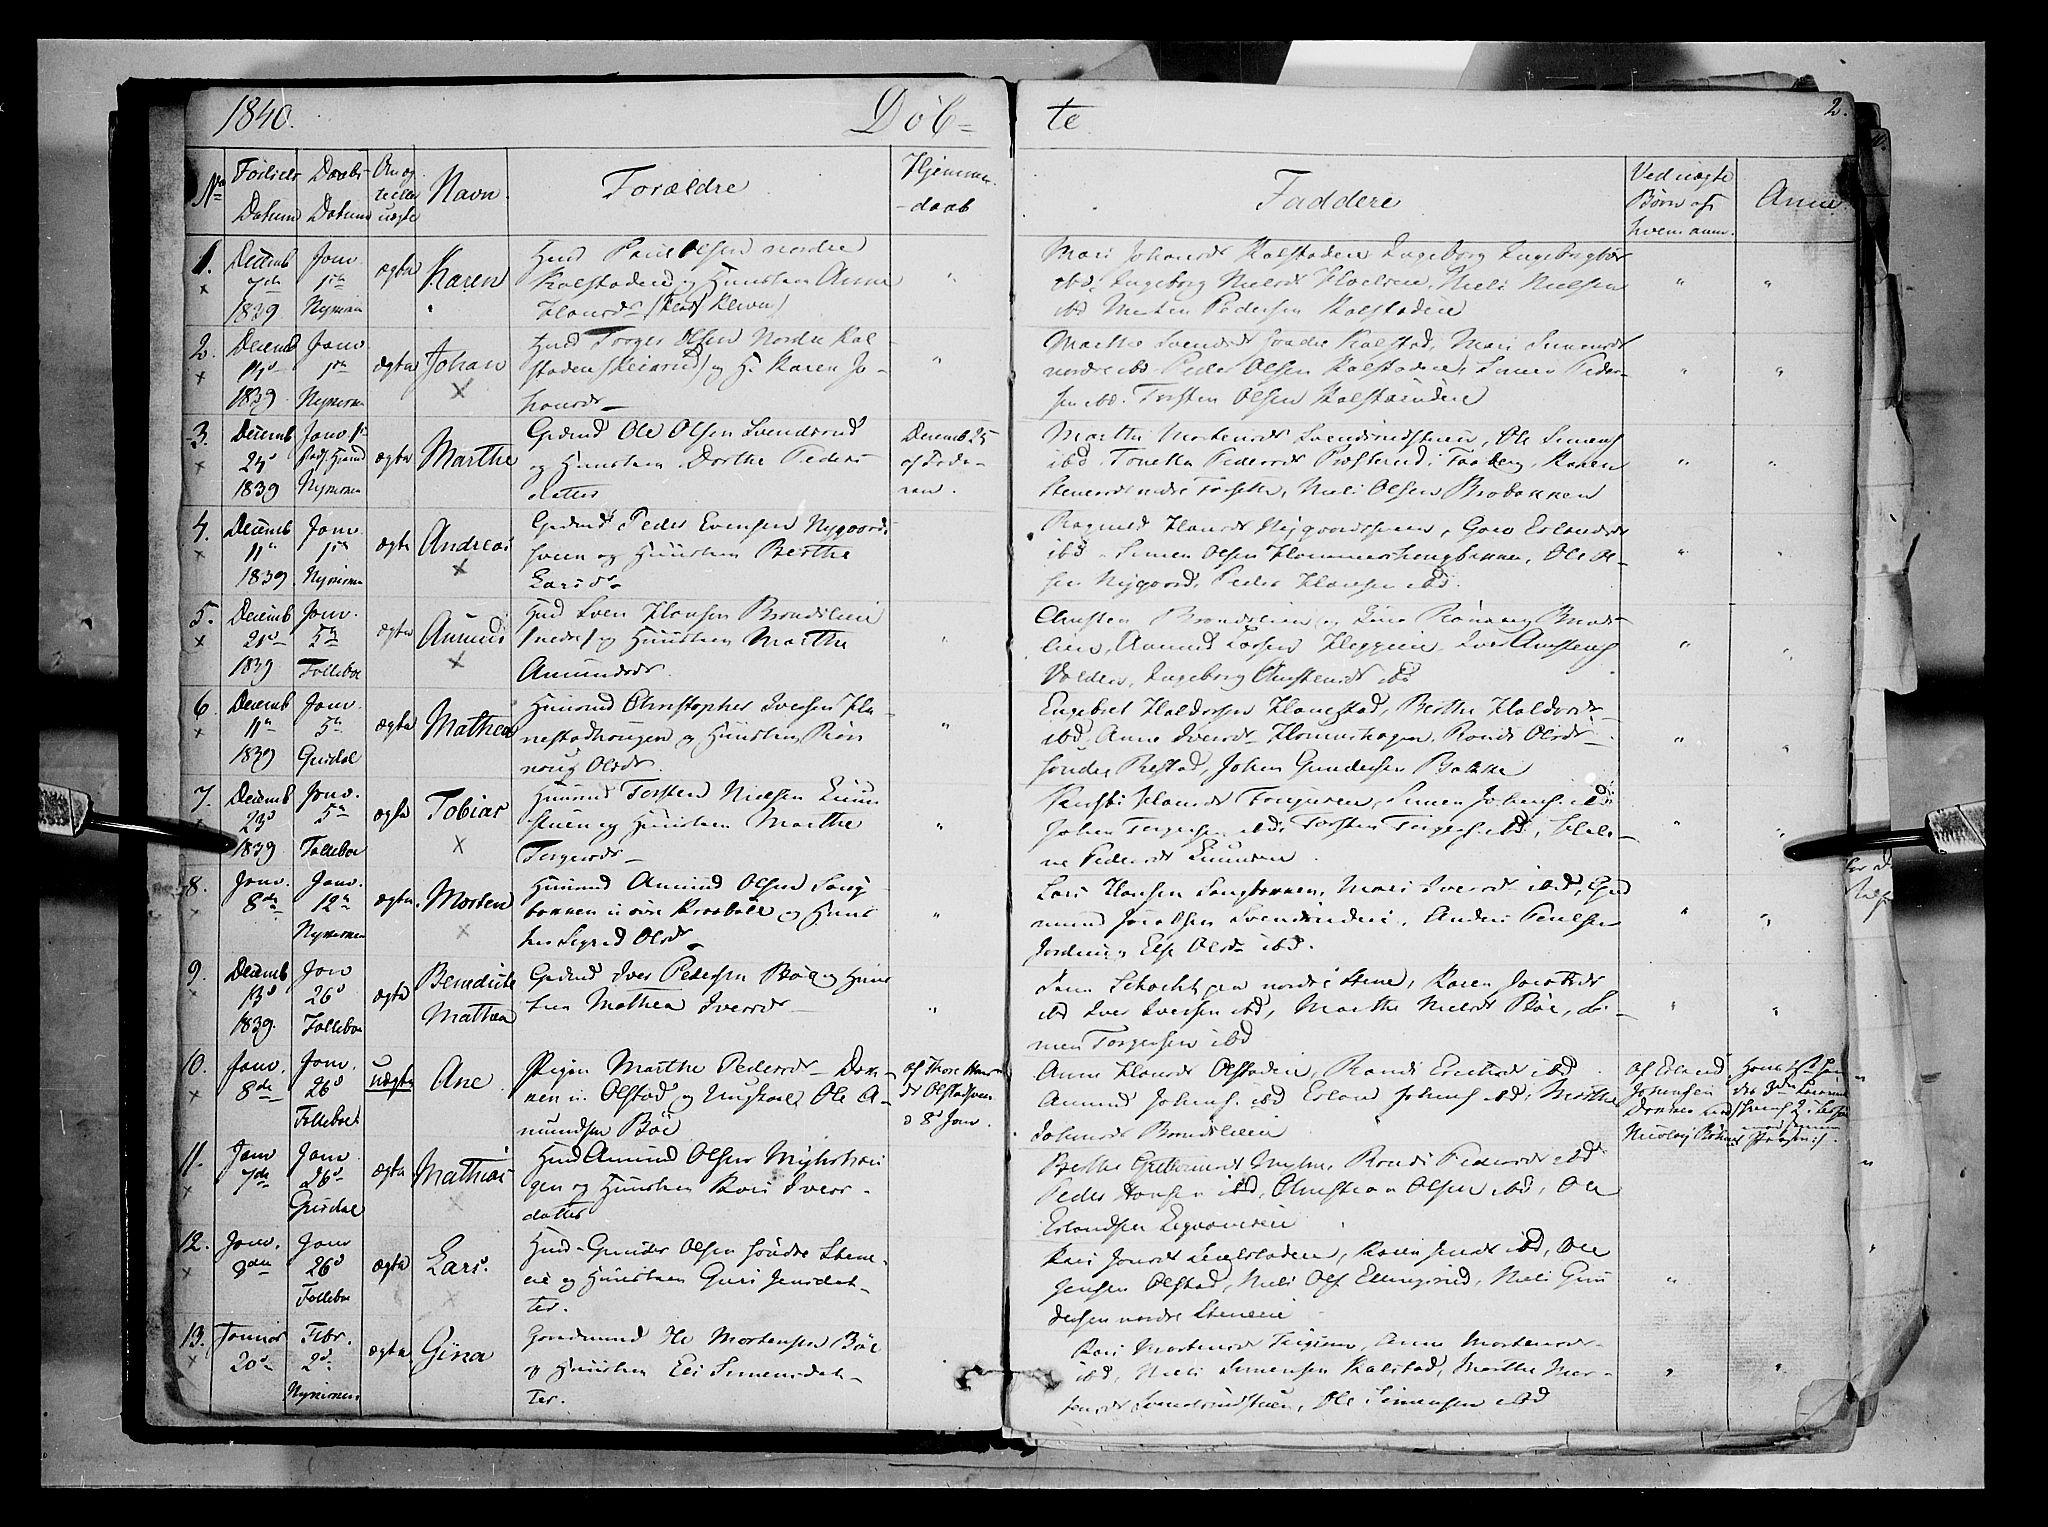 SAH, Gausdal prestekontor, Ministerialbok nr. 7, 1840-1850, s. 2